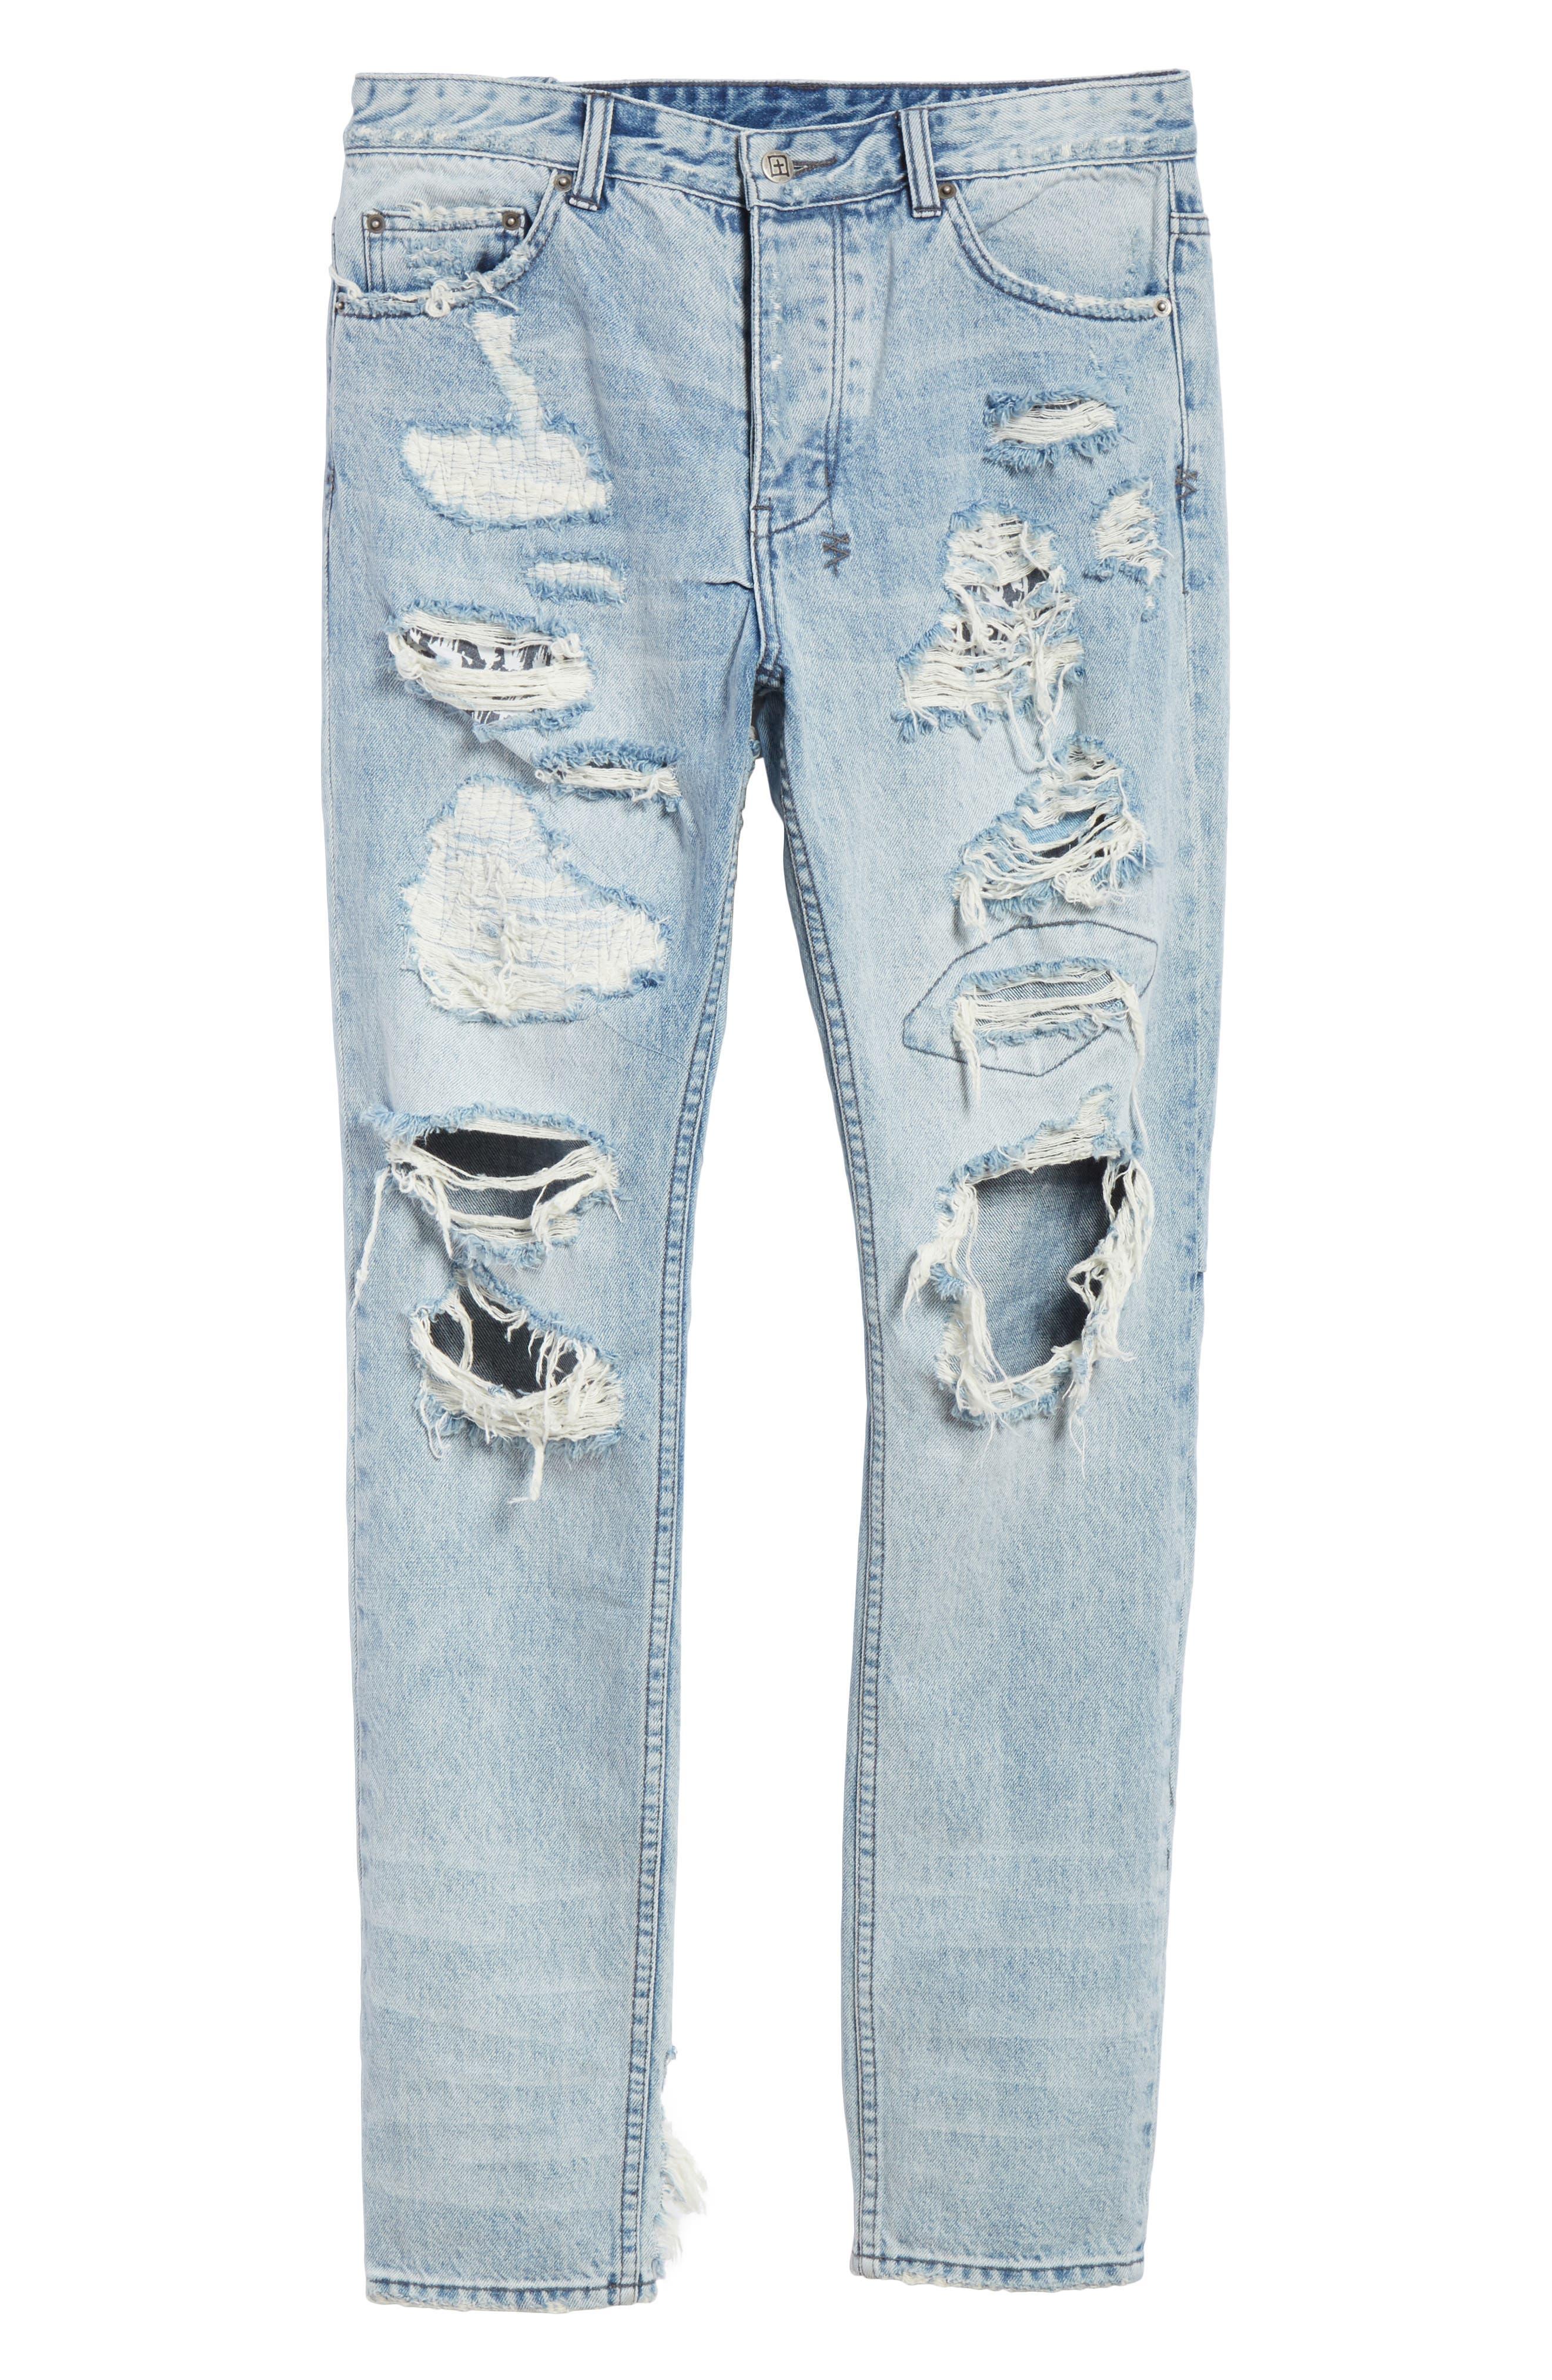 Chitch Tropo Trash Jeans,                             Alternate thumbnail 6, color,                             DENIM